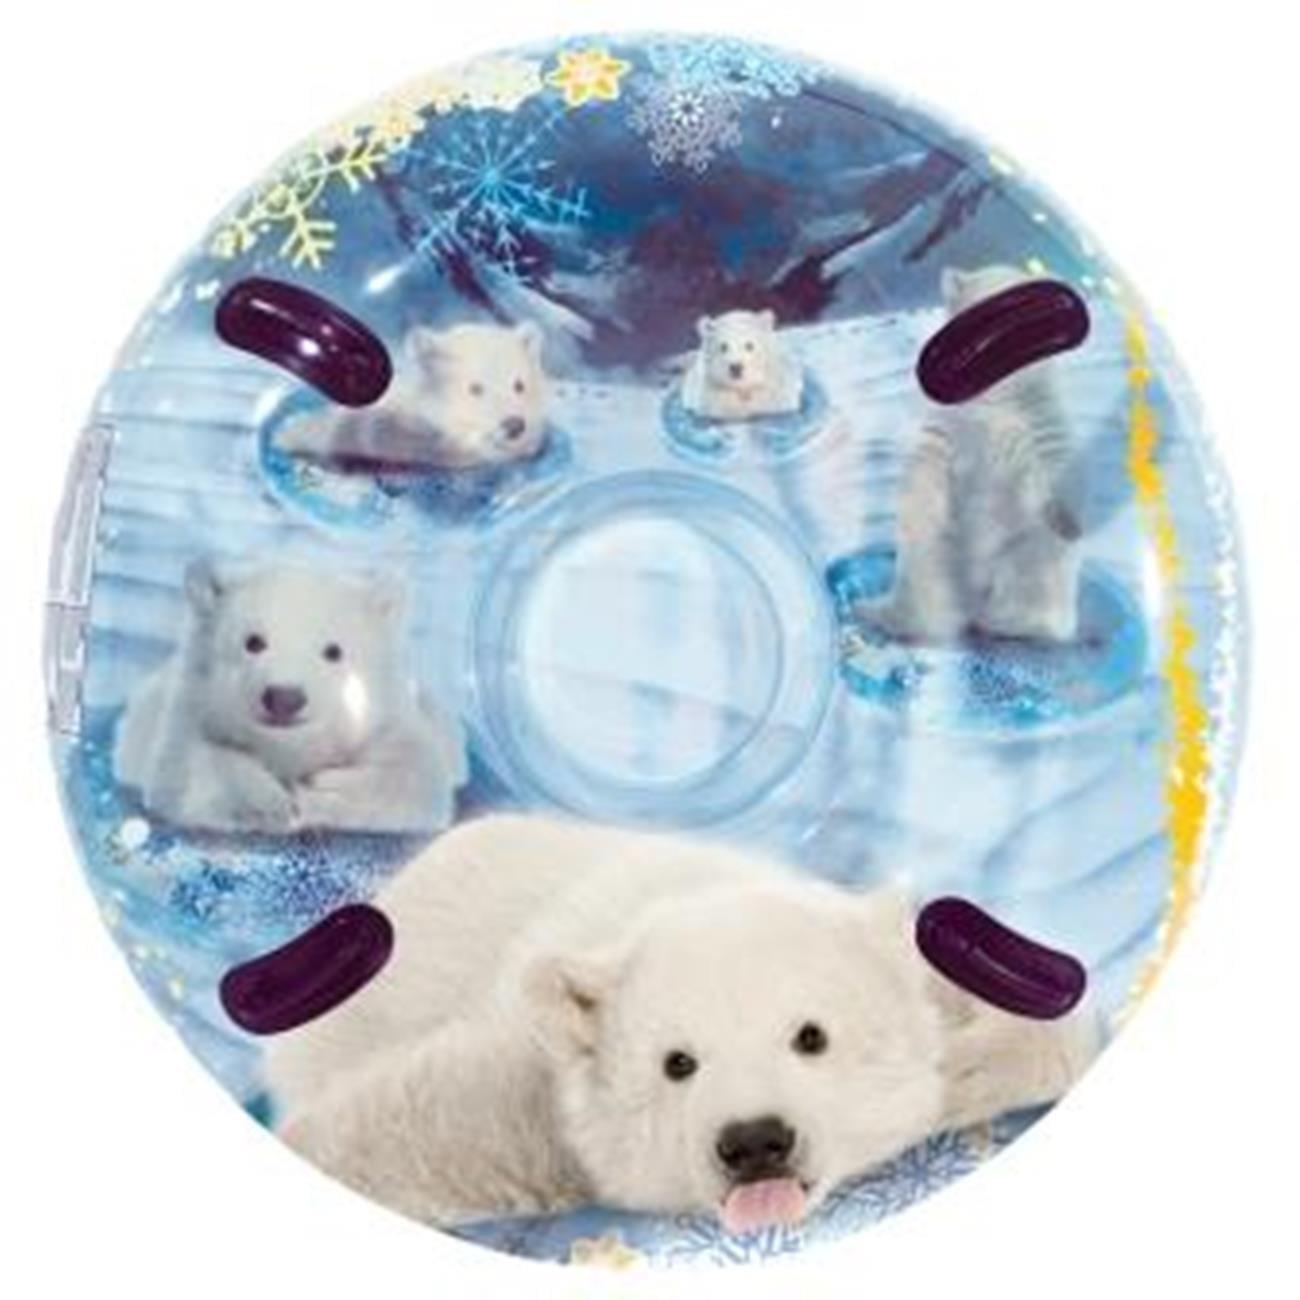 3D MegaBlaster Snowtube Polar, polar bear, 54in Snow Tube, Cleartop